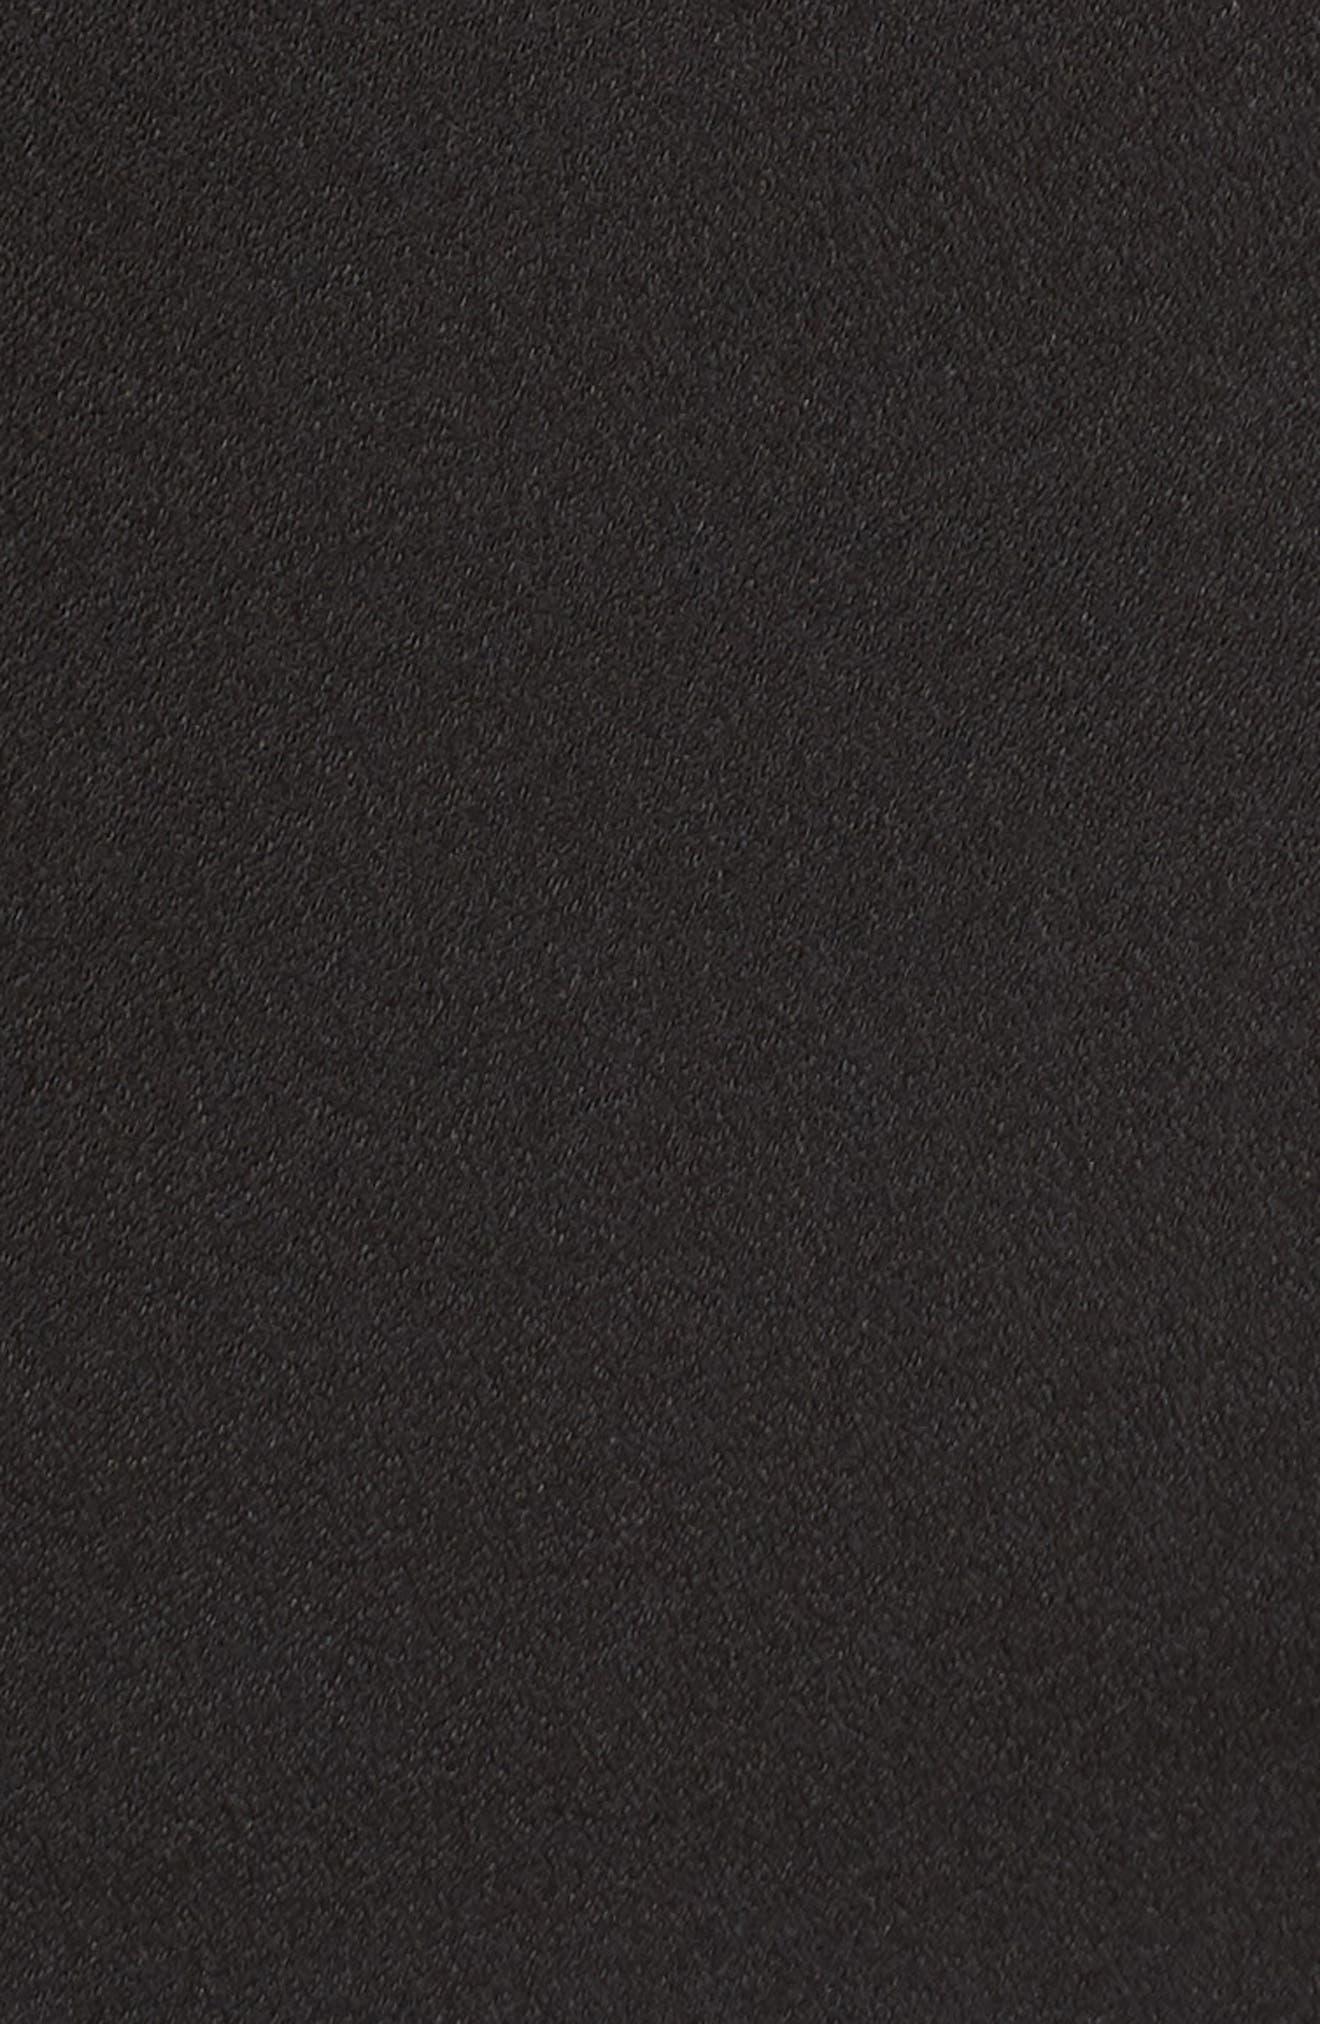 Asymmetric Ruffle Hem Dress,                             Alternate thumbnail 12, color,                             001